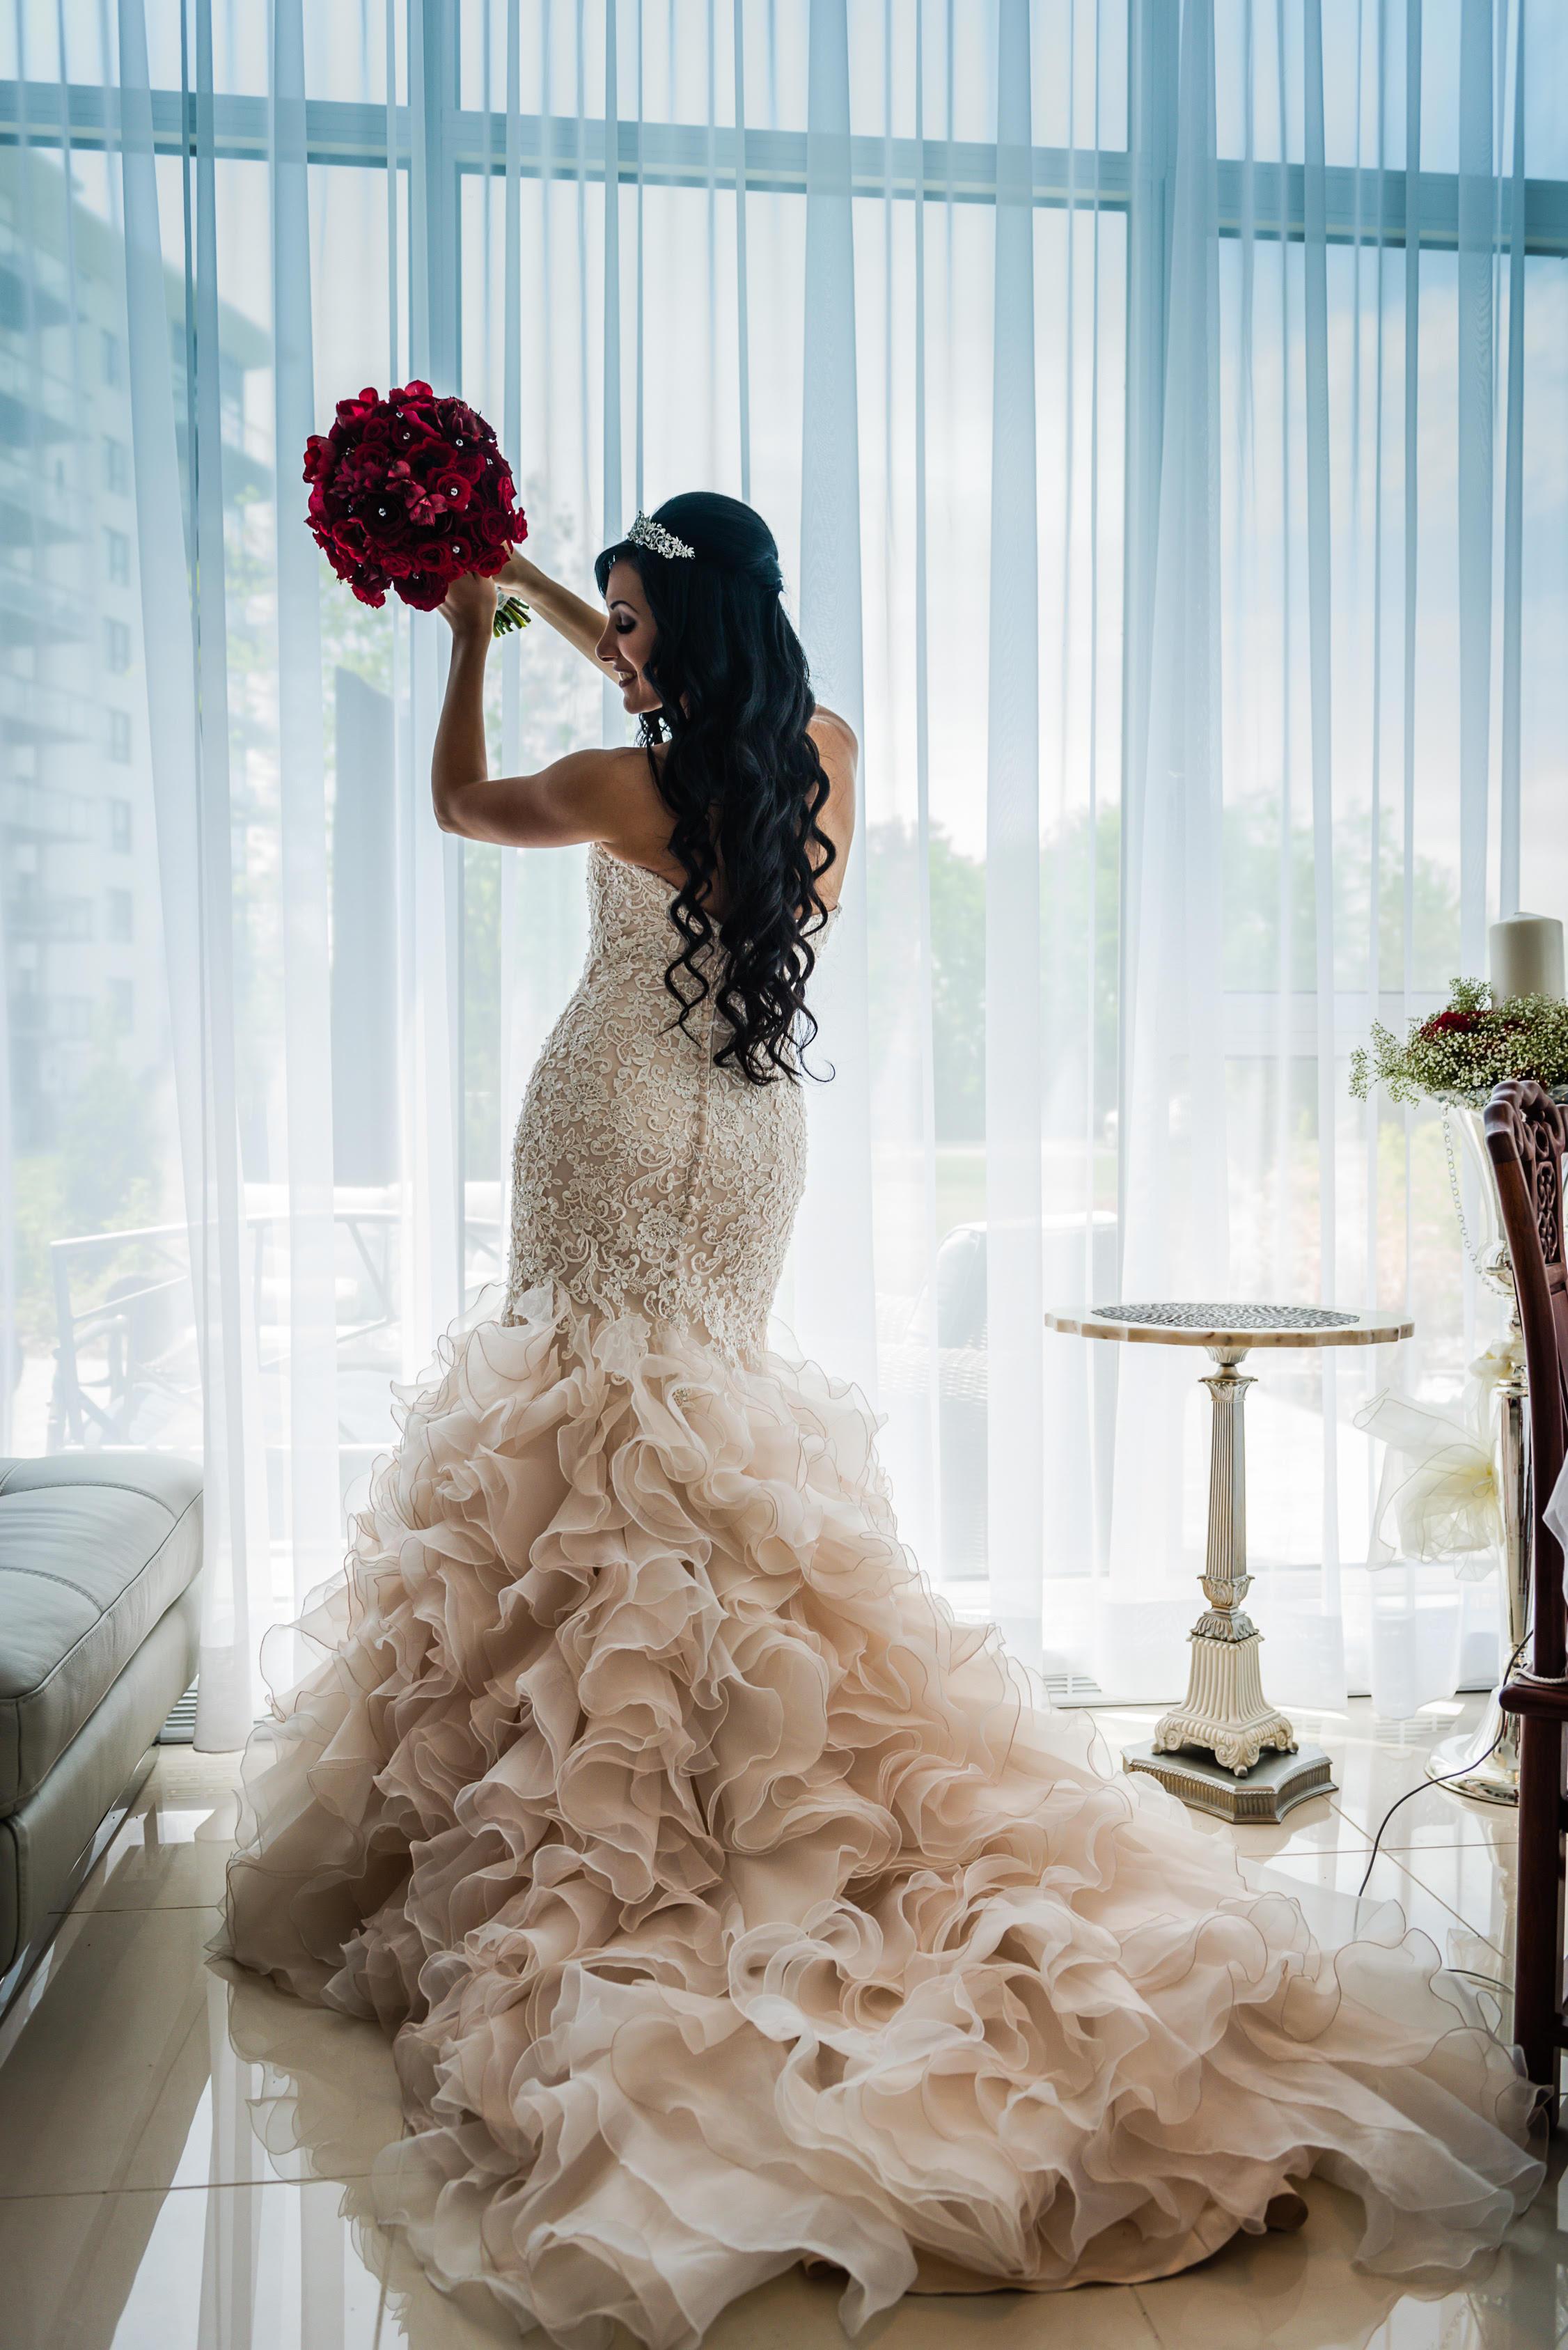 maria sideris wedding pic1.jpg